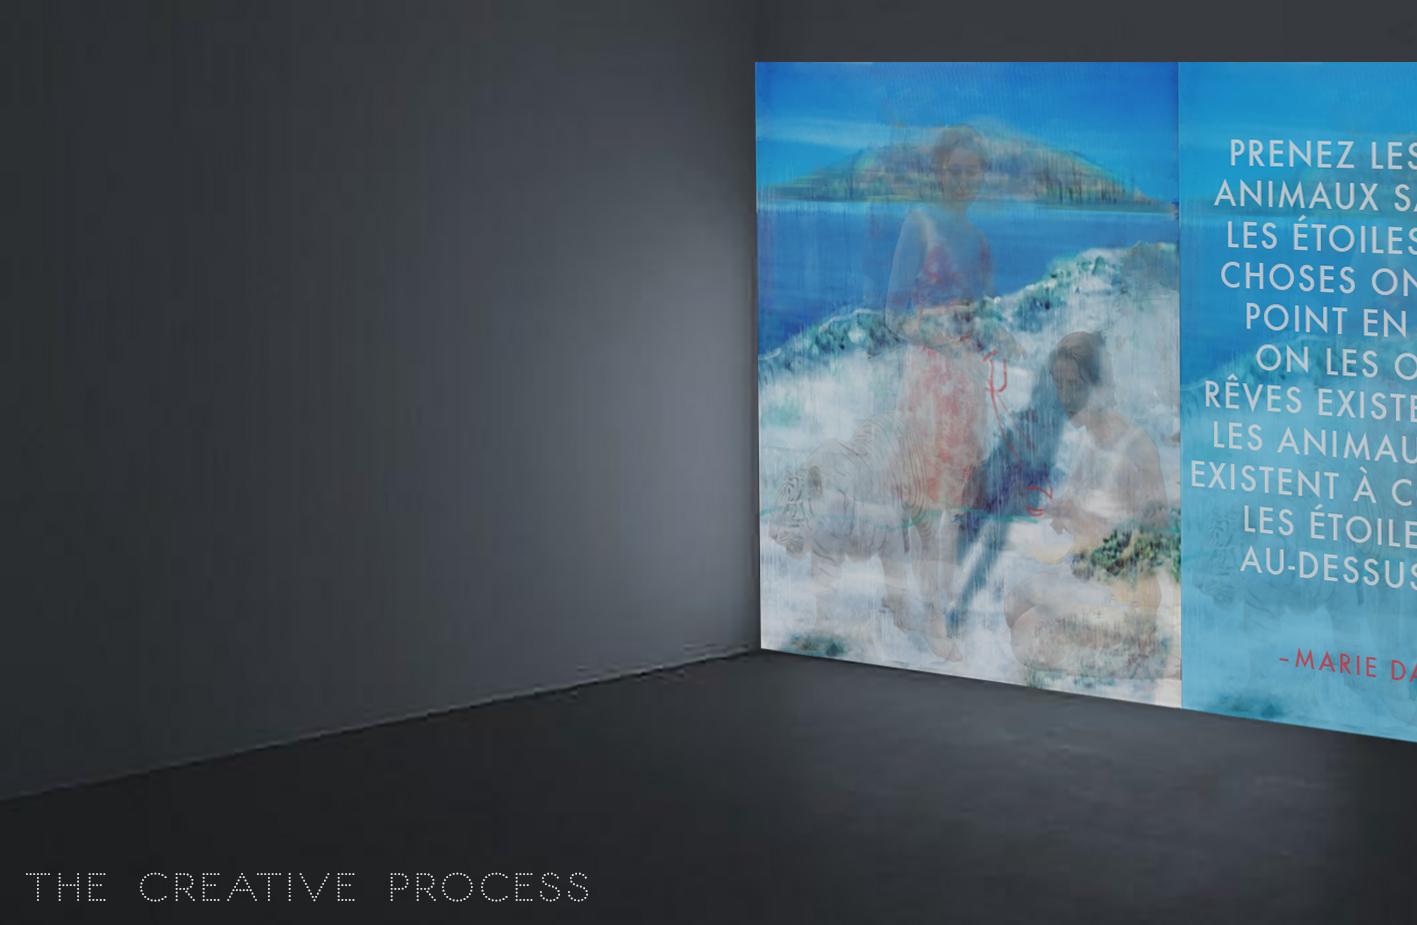 creative-process-project2-marie-darrieussecq.jpg